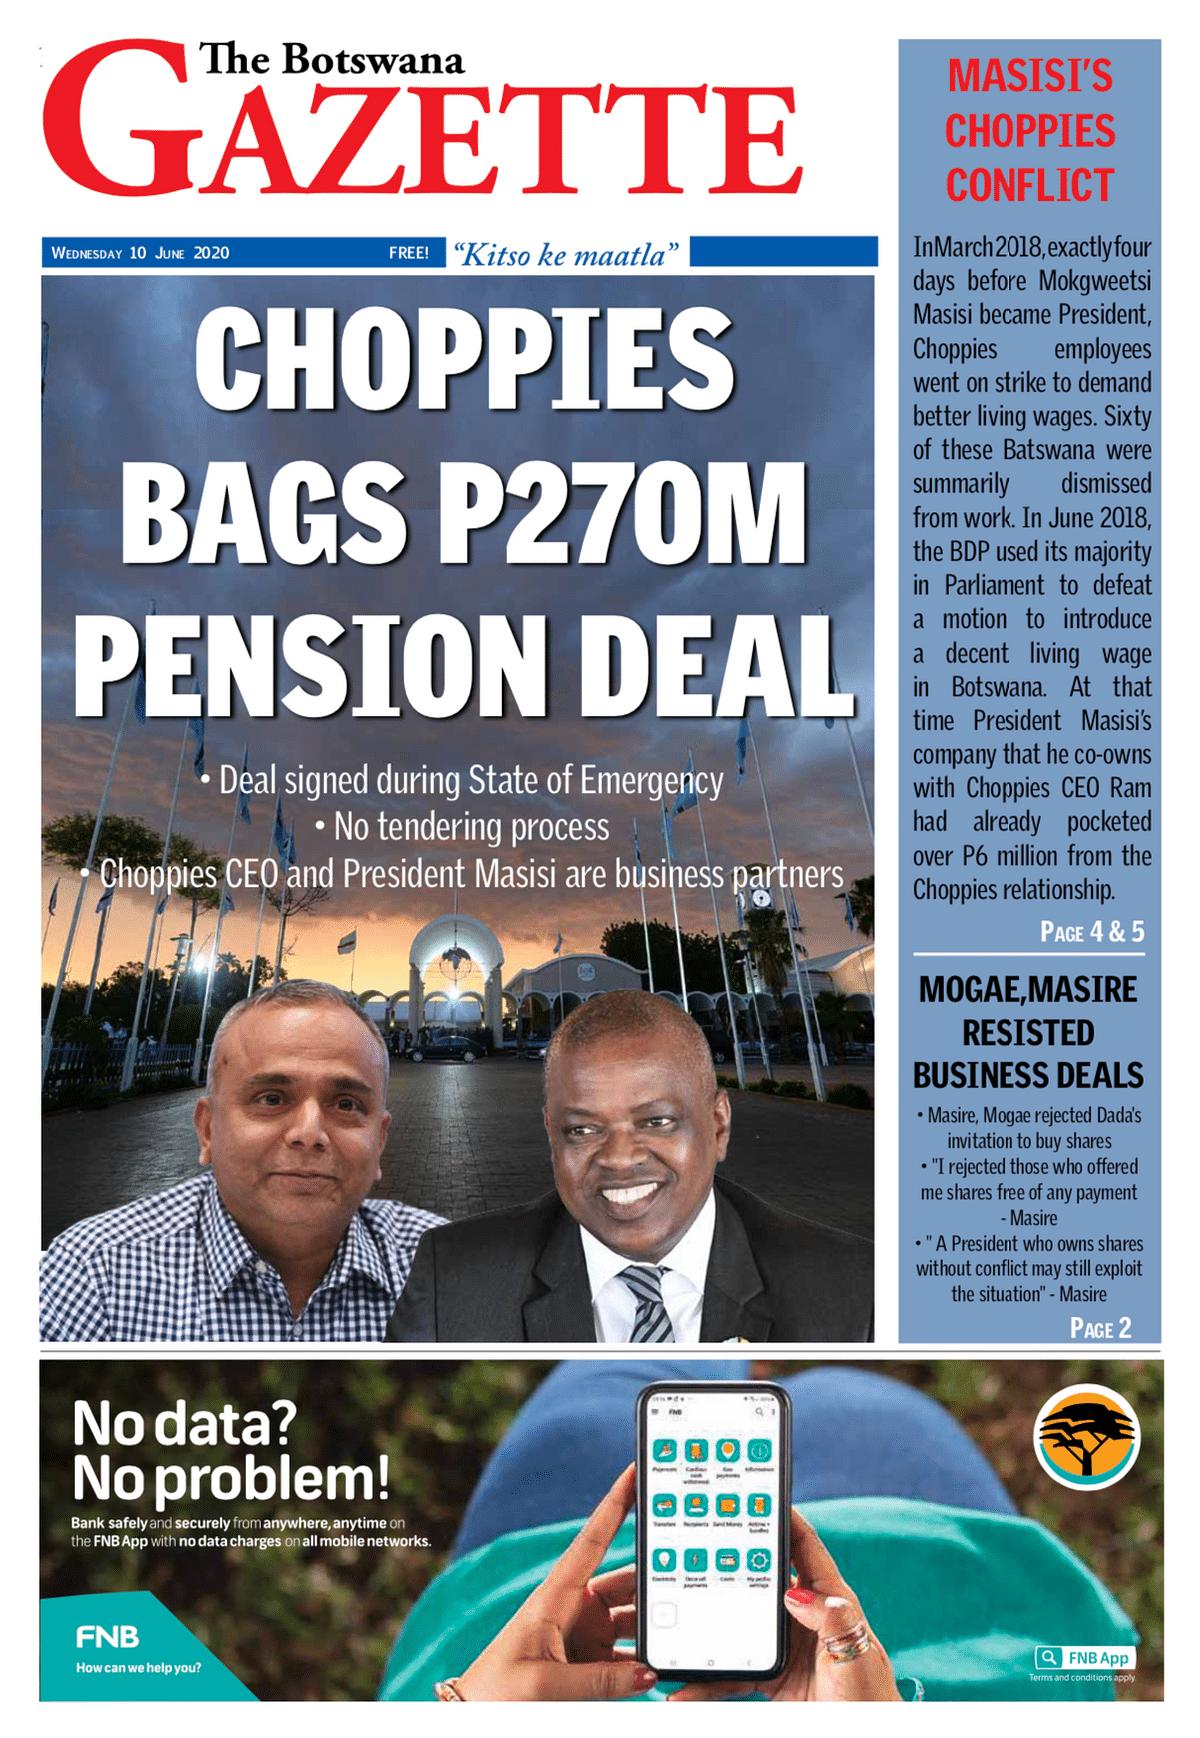 The Botswana Gazette 10.6.2020